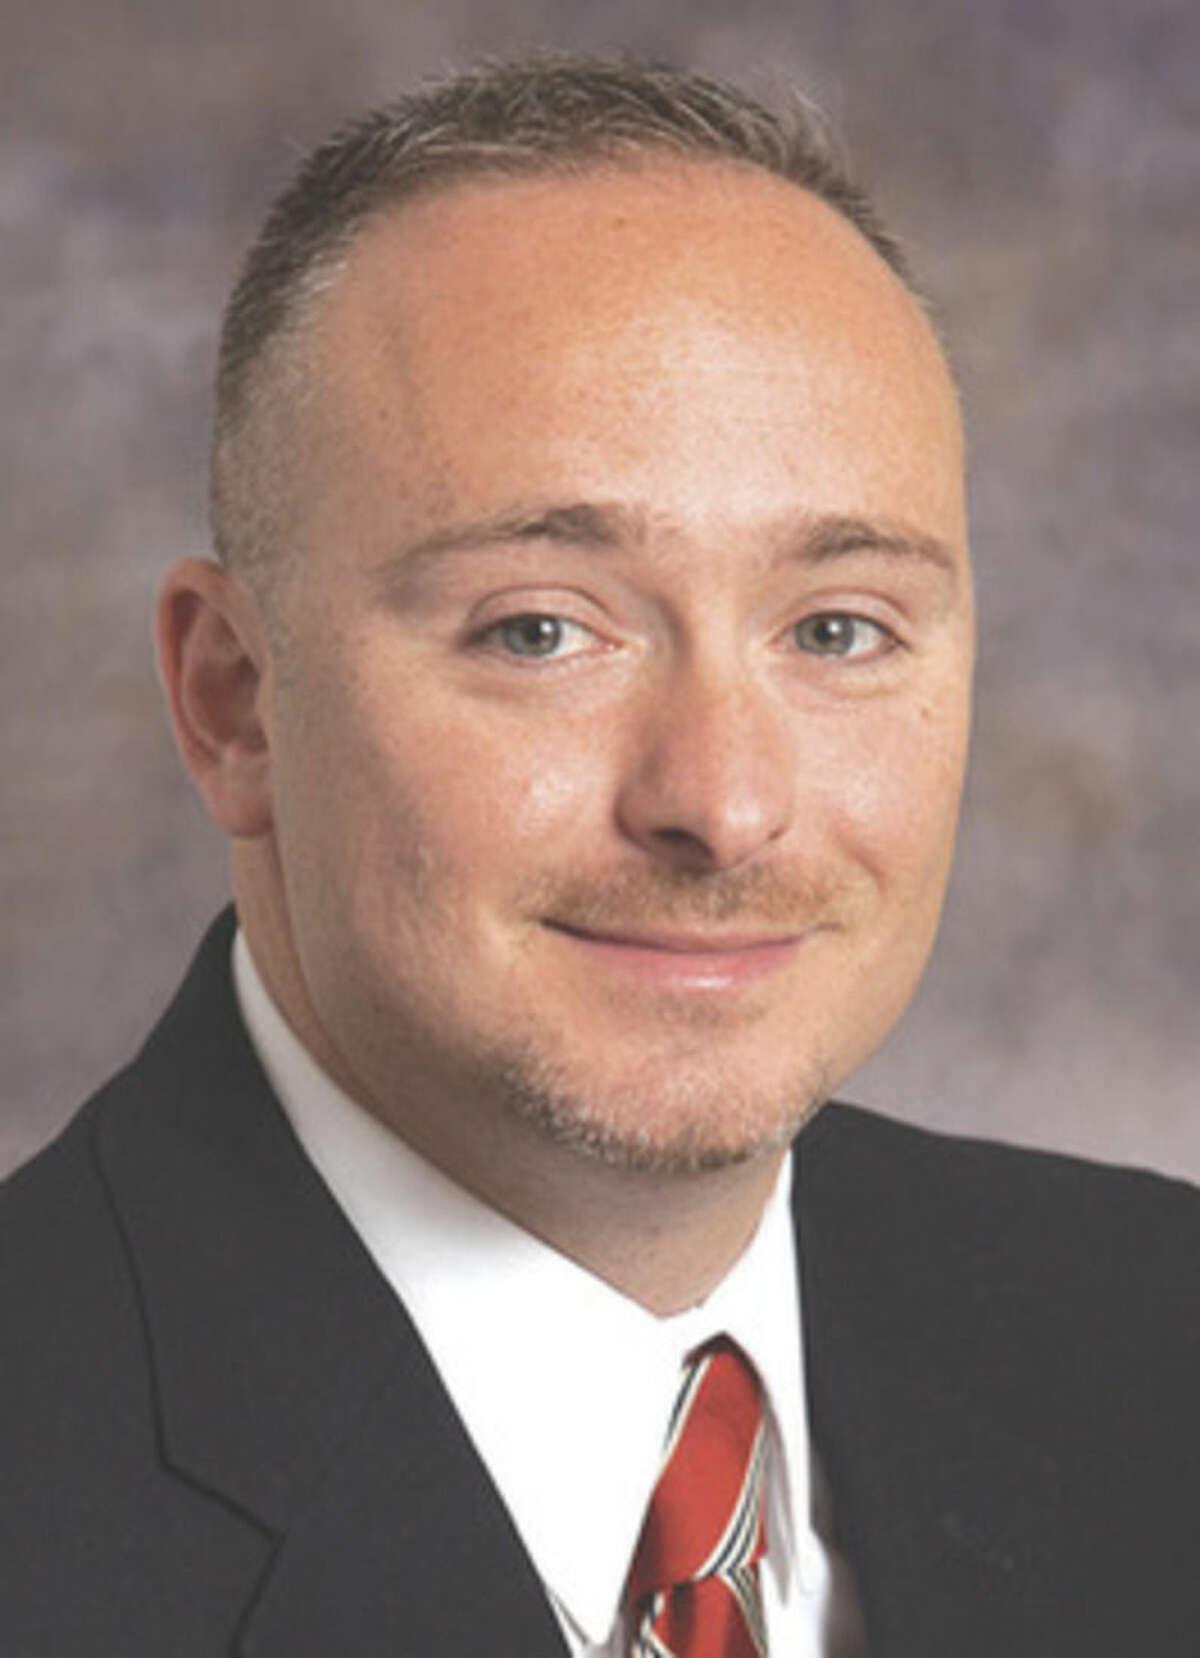 Michael Demo